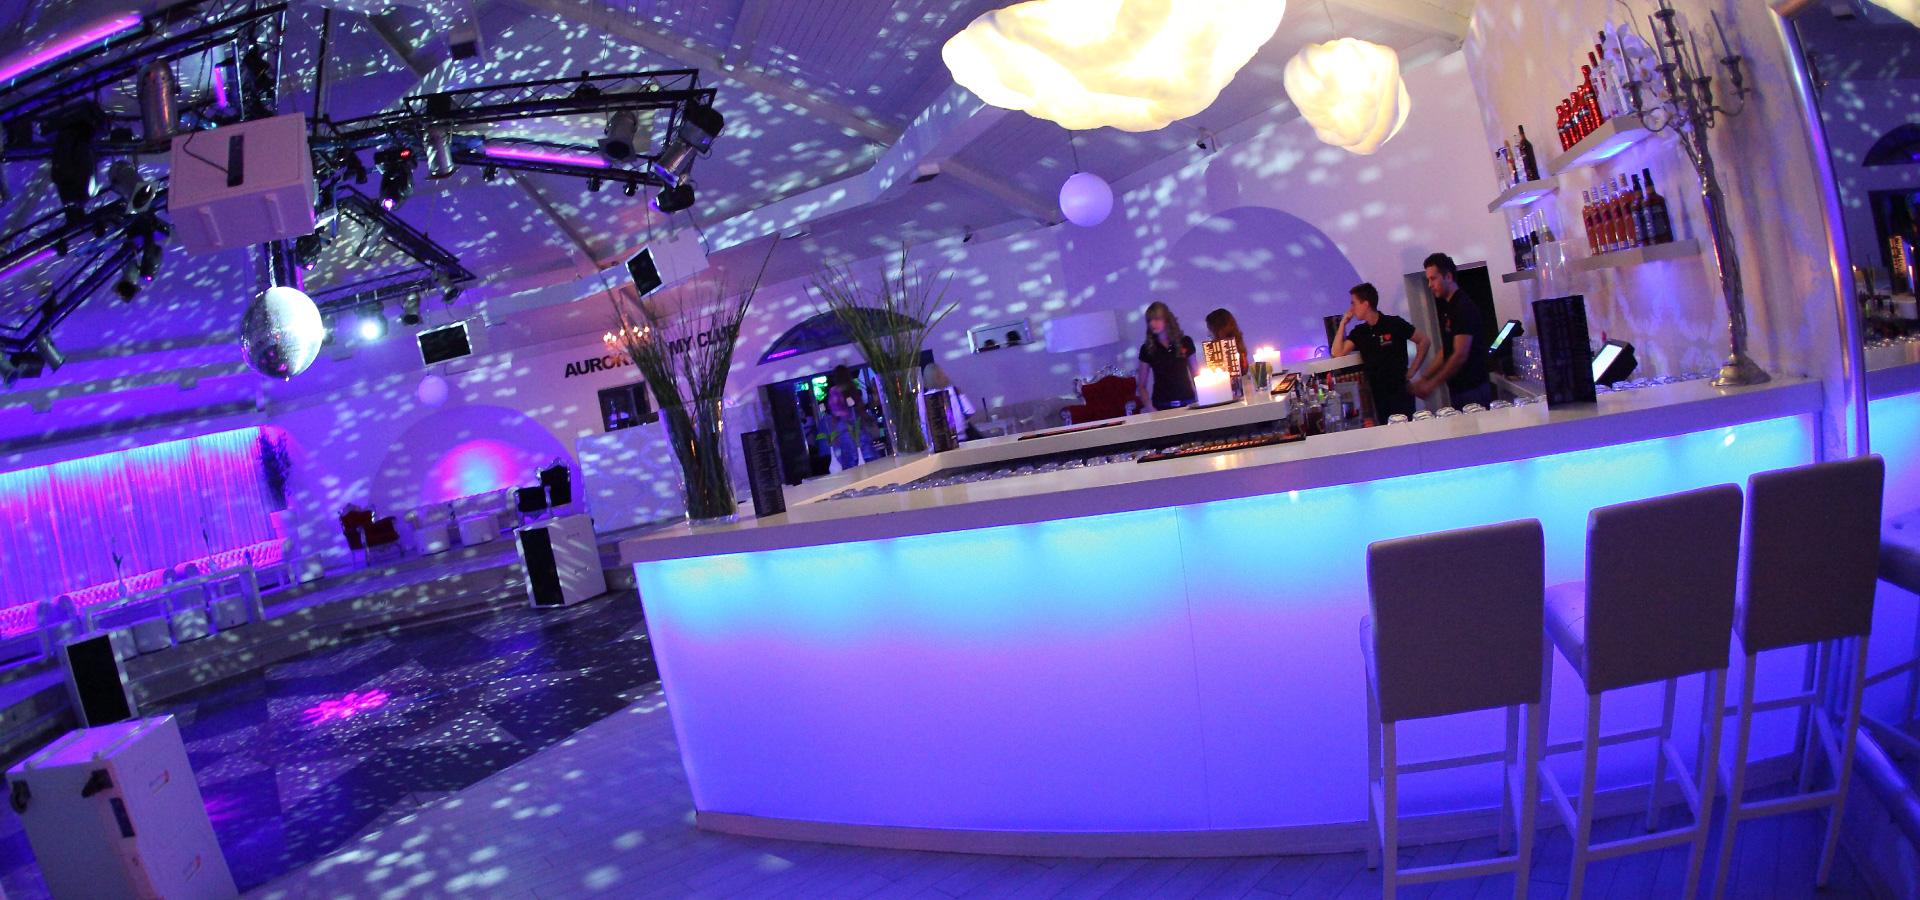 Aurora Club 7